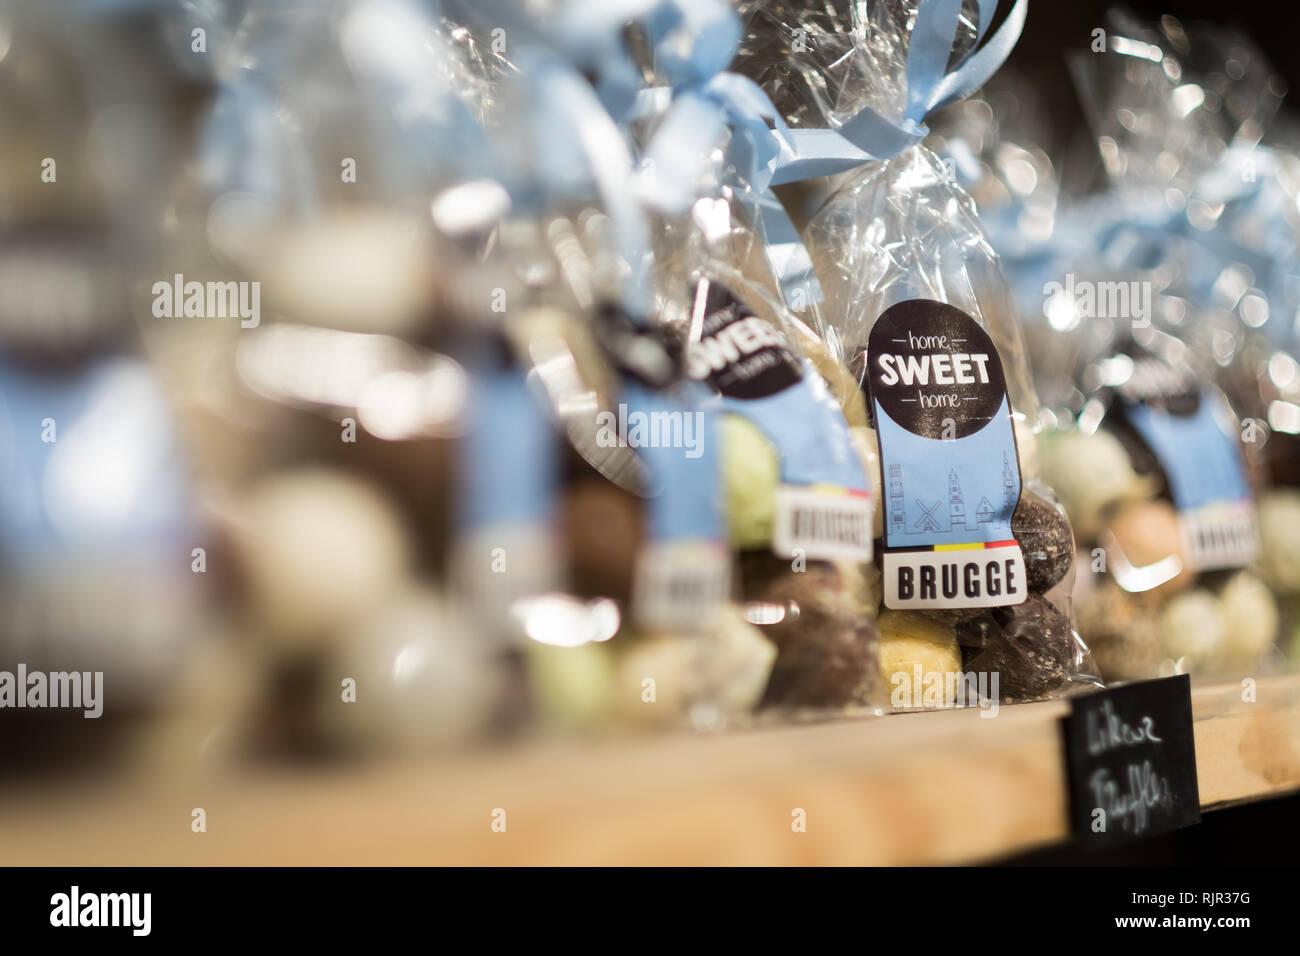 Bruges Brugge Belgium - Stock Image